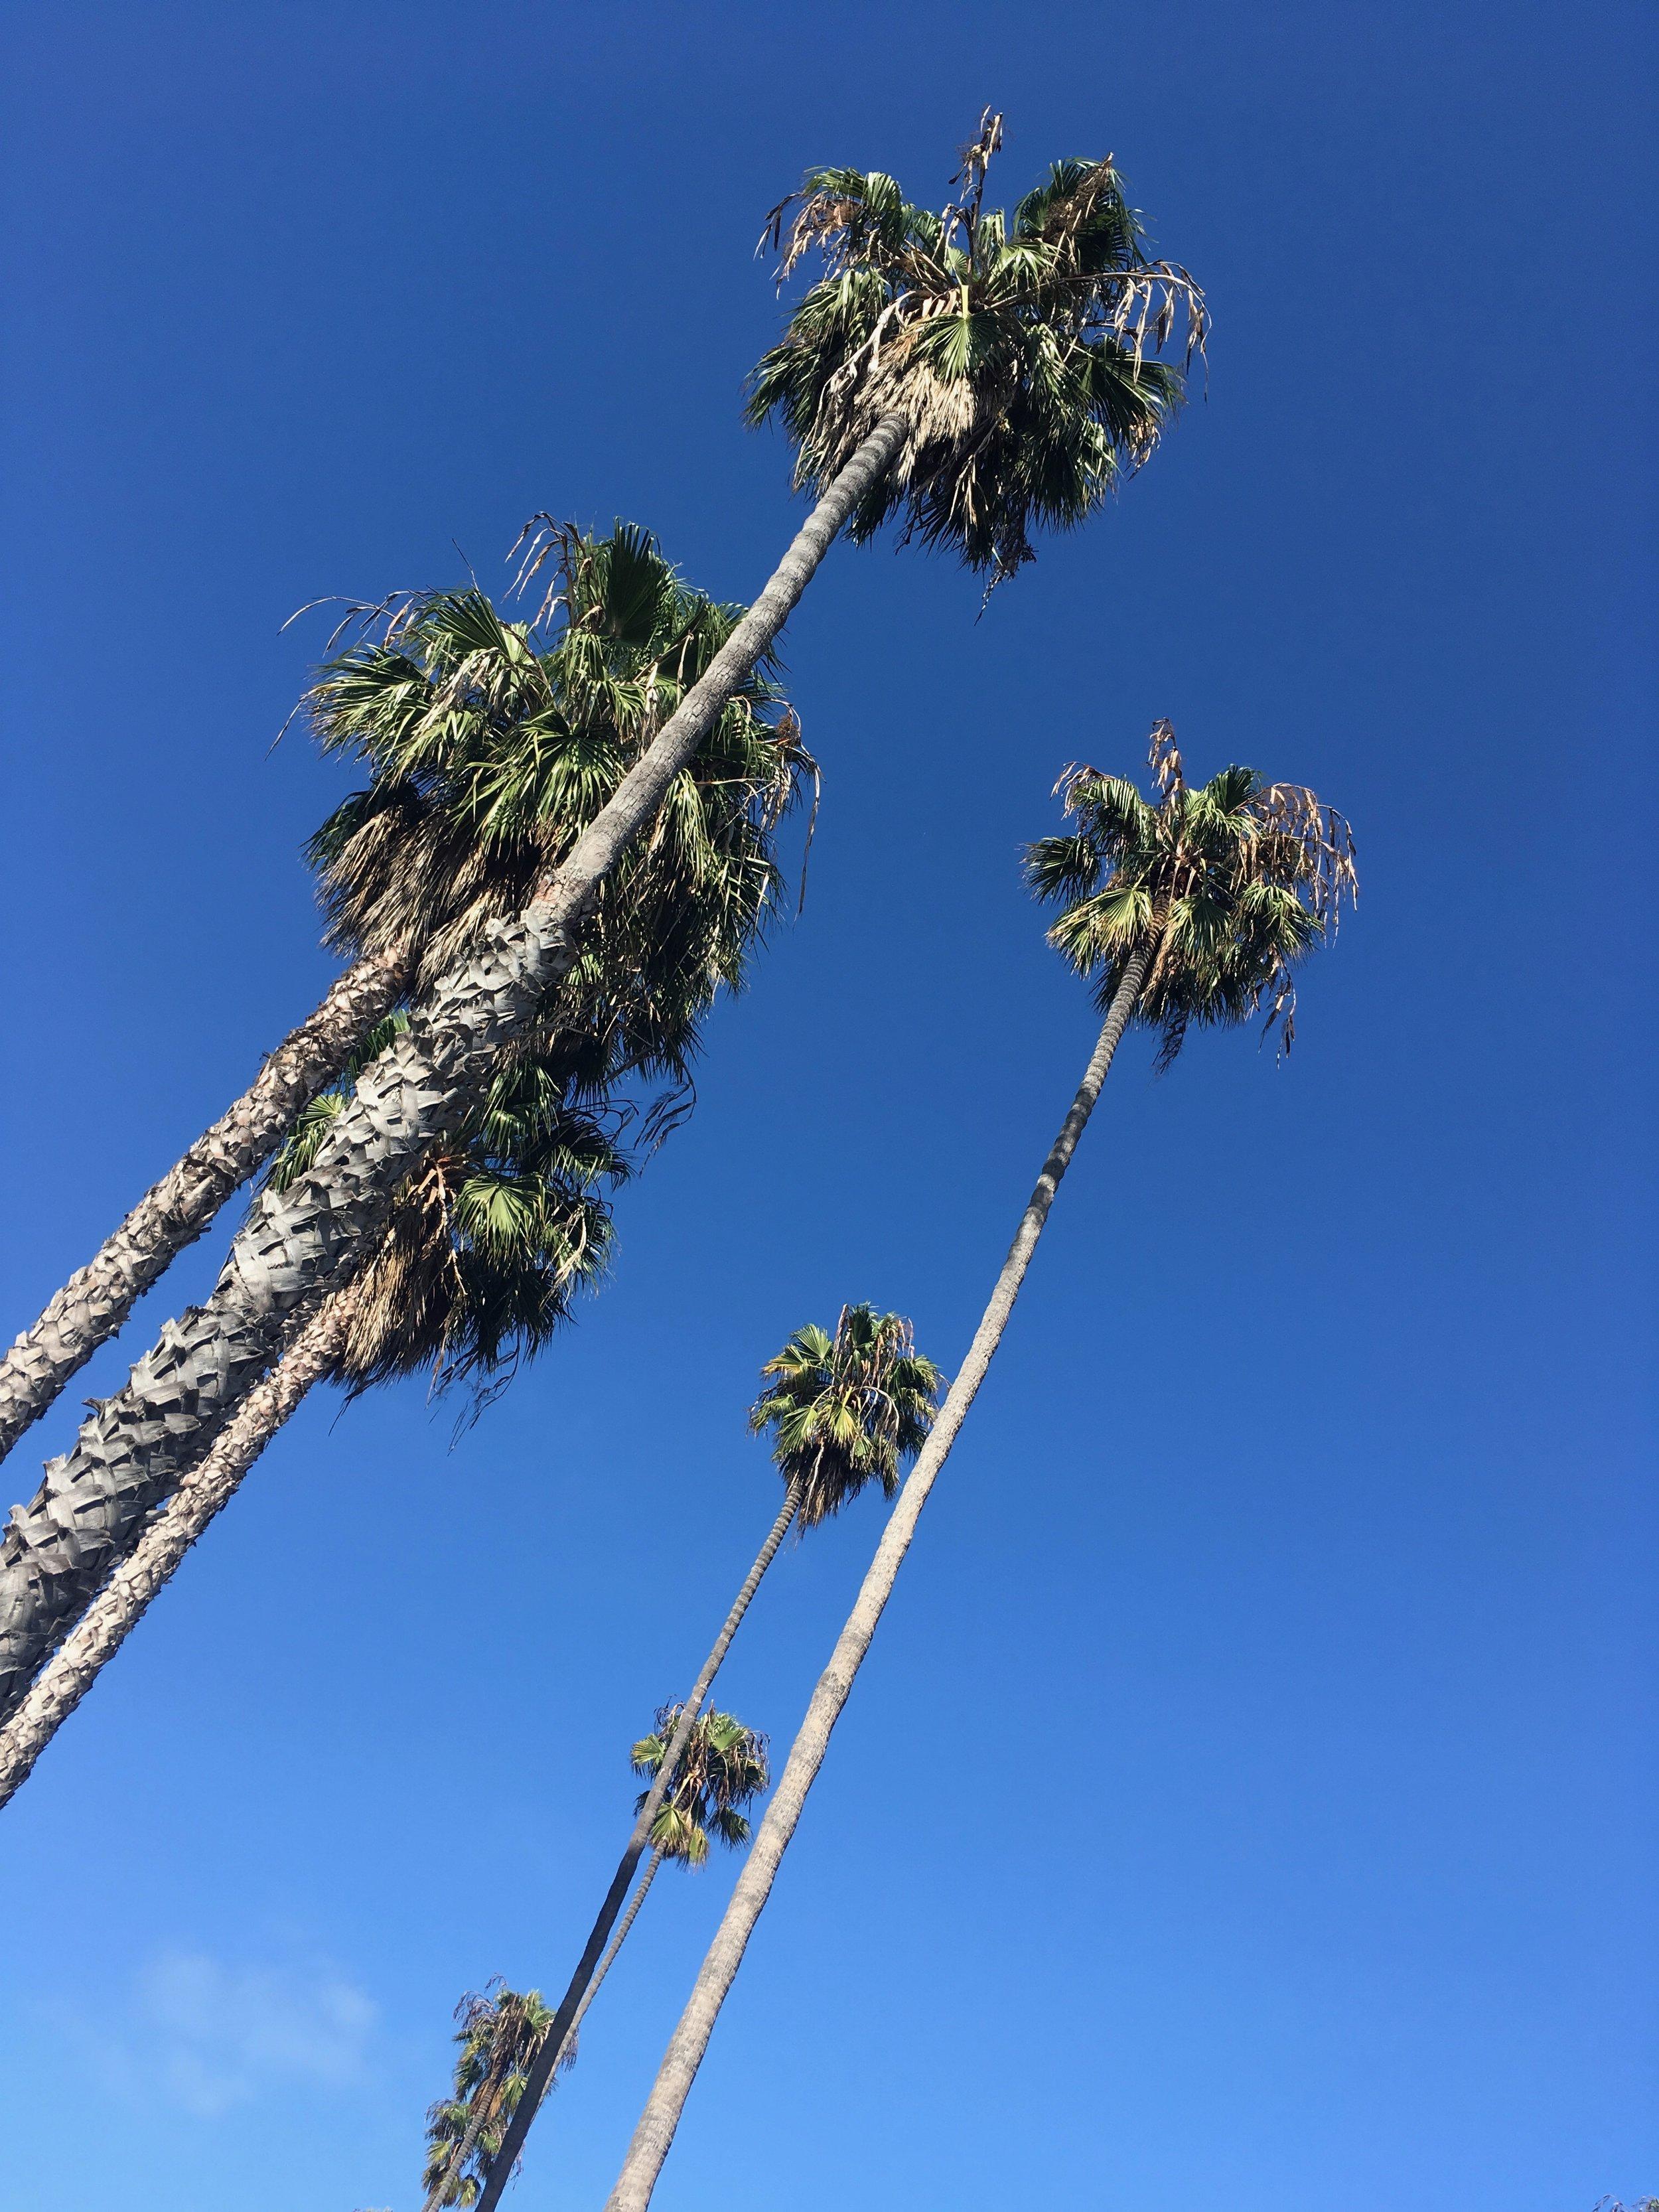 Margaret_Alba_Los_Angeles-3.jpg